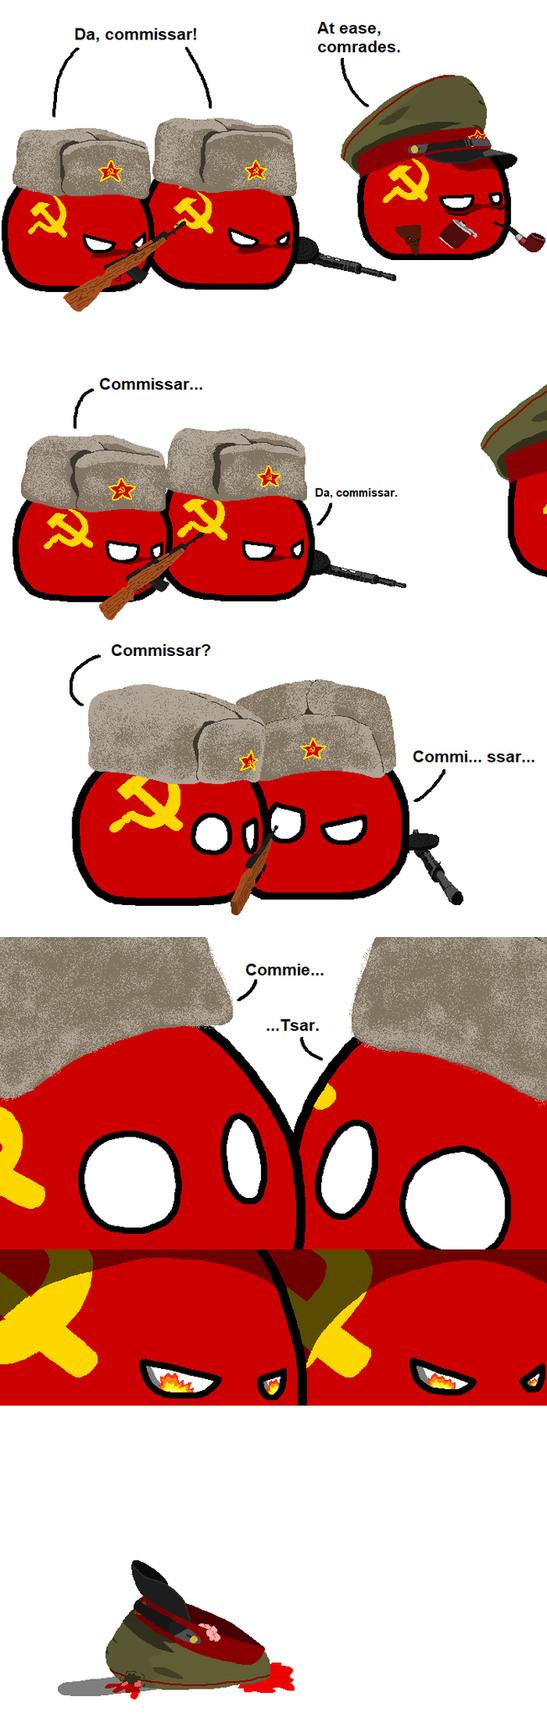 The tsar - meme